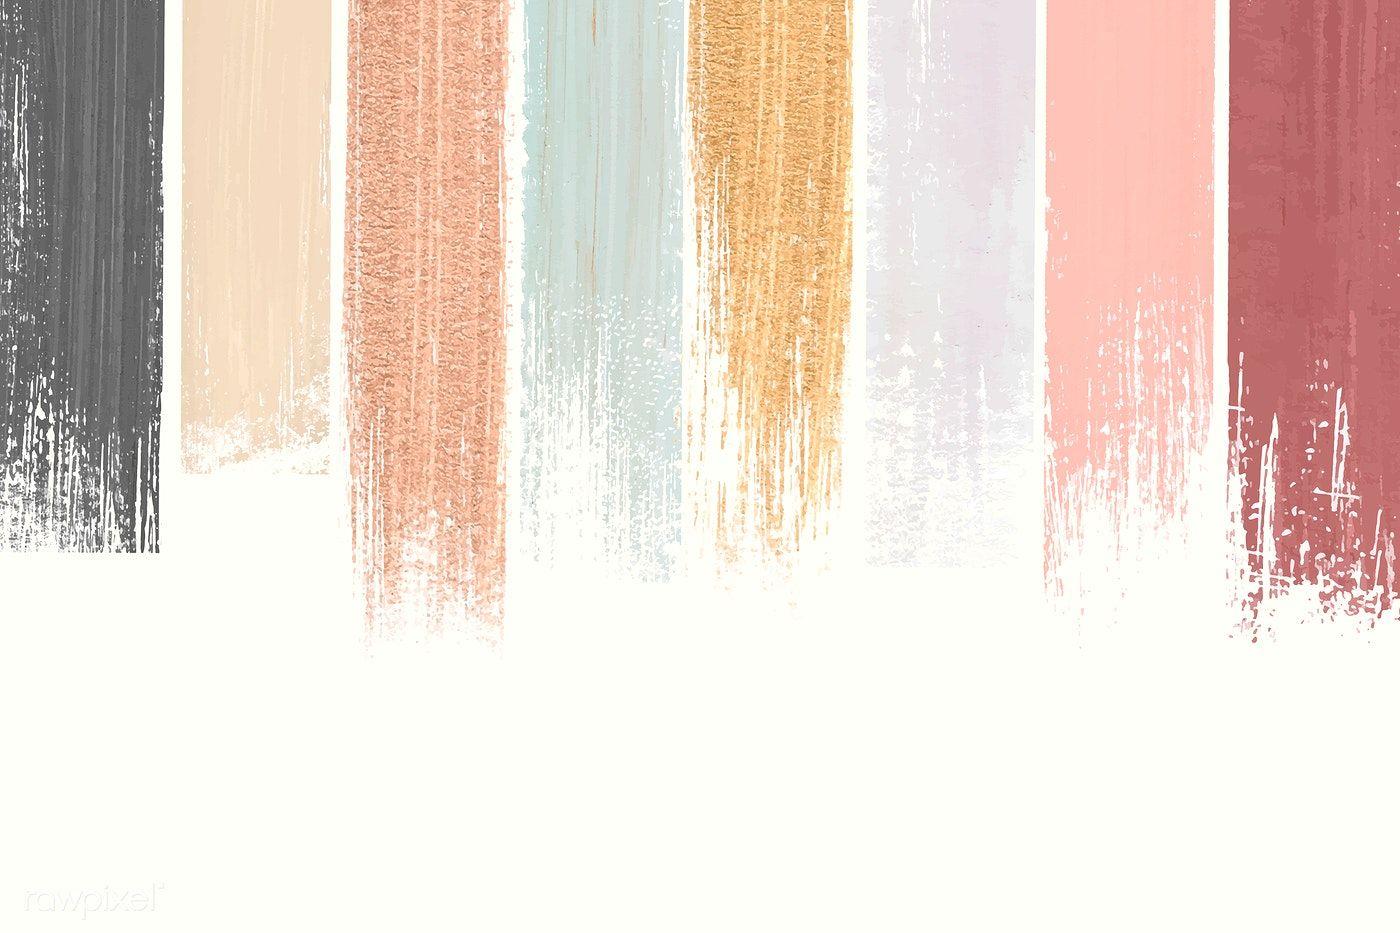 Pastel Shimmering Acrylic Brush Stroke Vector Free Image By Rawpixel Com Adj วอลเปเปอร พ นหล ง